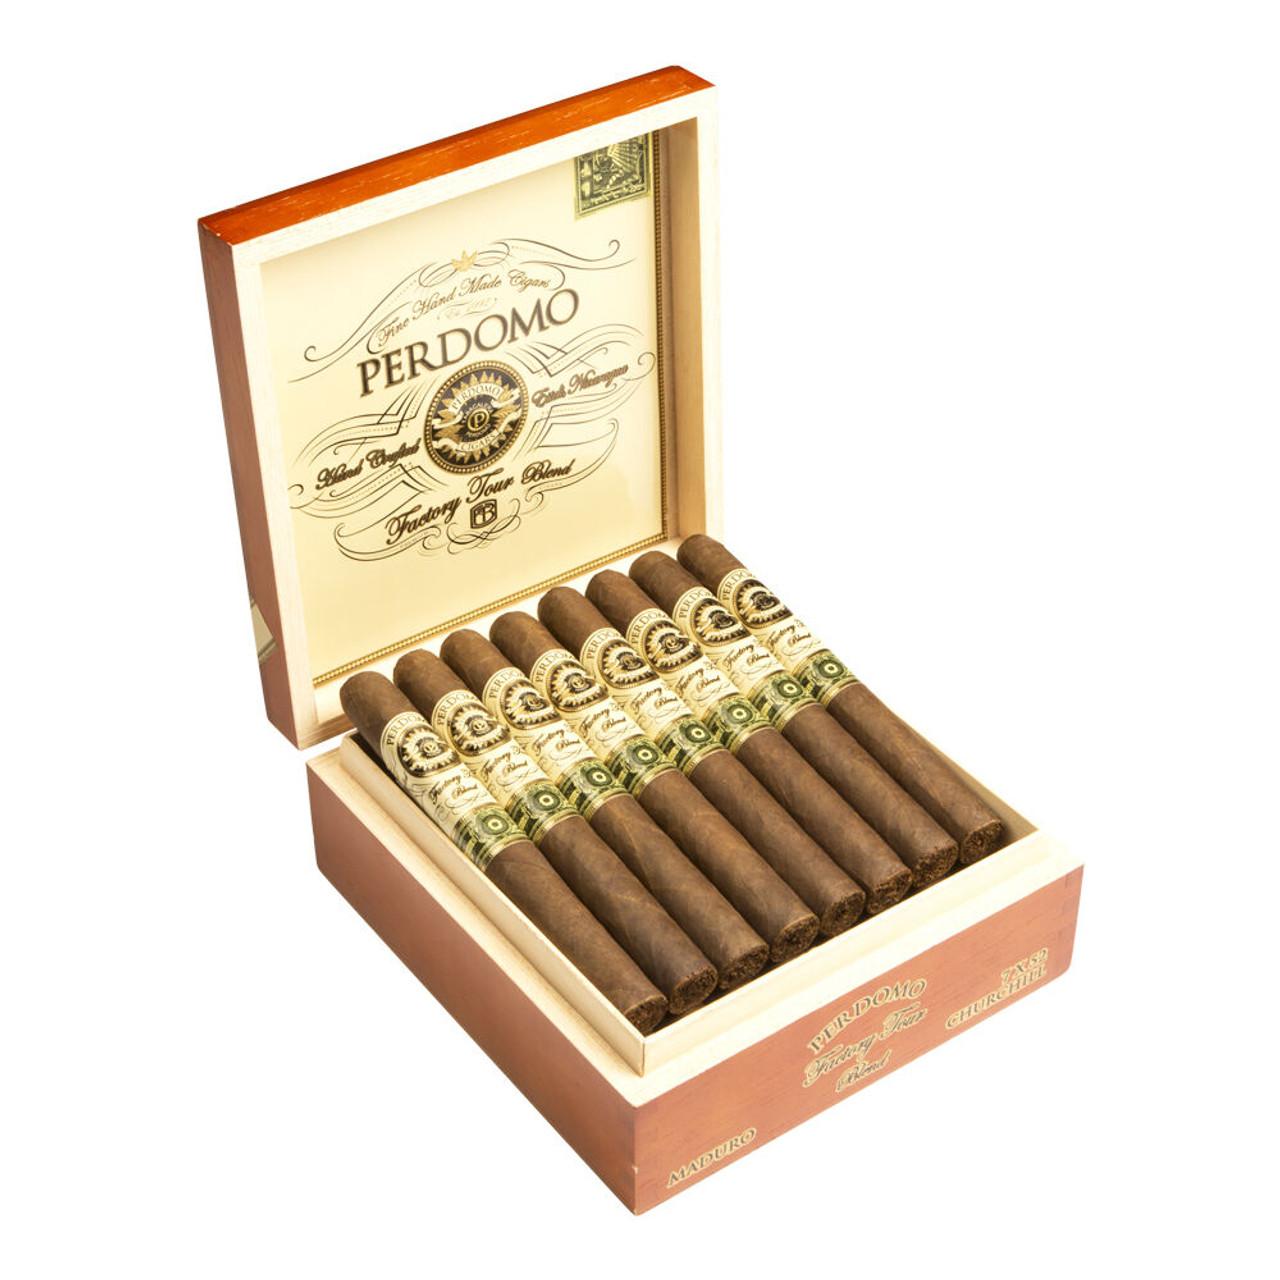 Perdomo Factory Tour Blend Maduro Churchill Cigars - 7.0 x 52 (Box of 24)